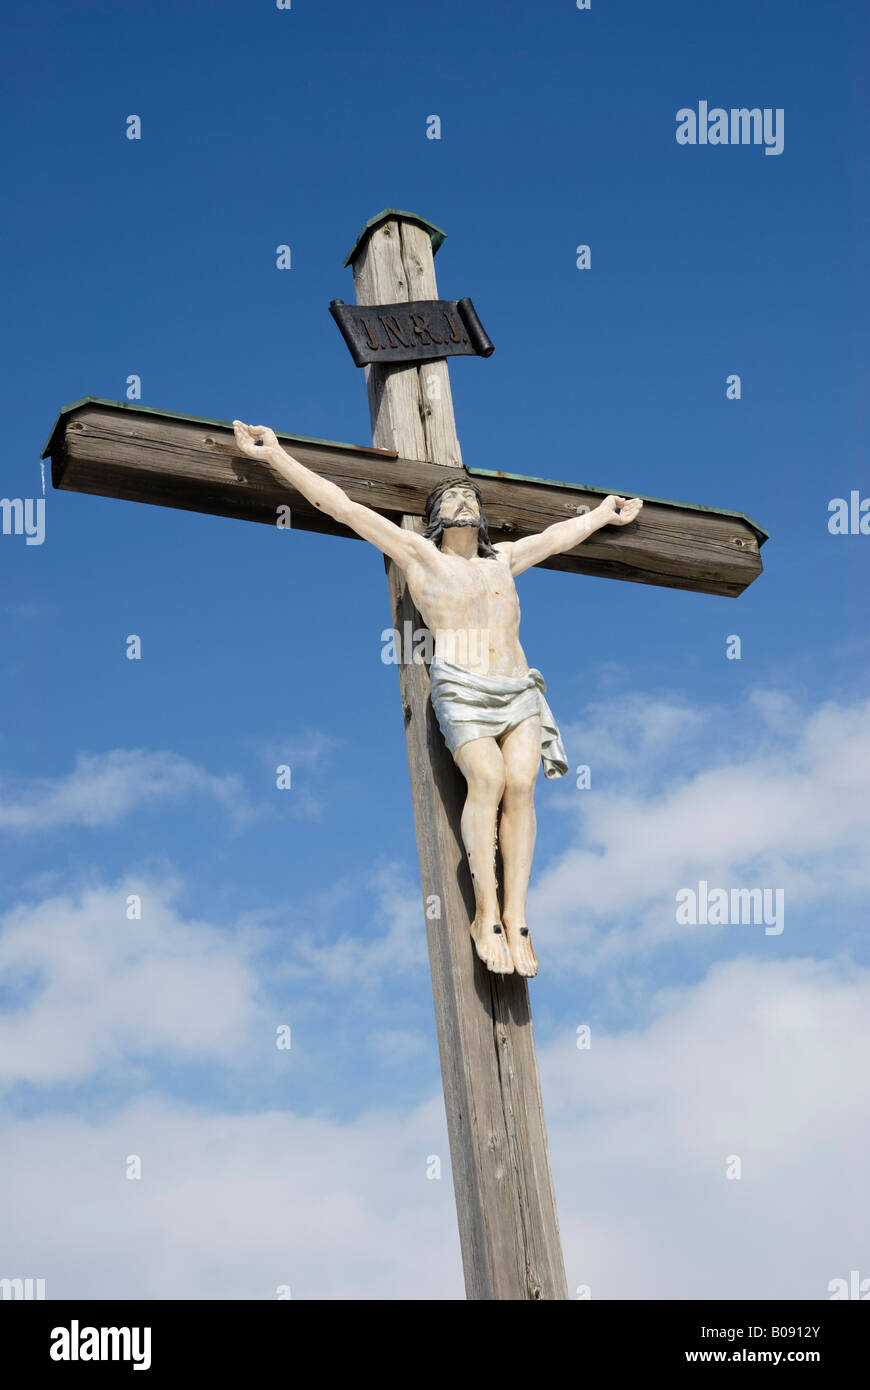 jesus cross bavarian crosses stock photos jesus cross bavarian